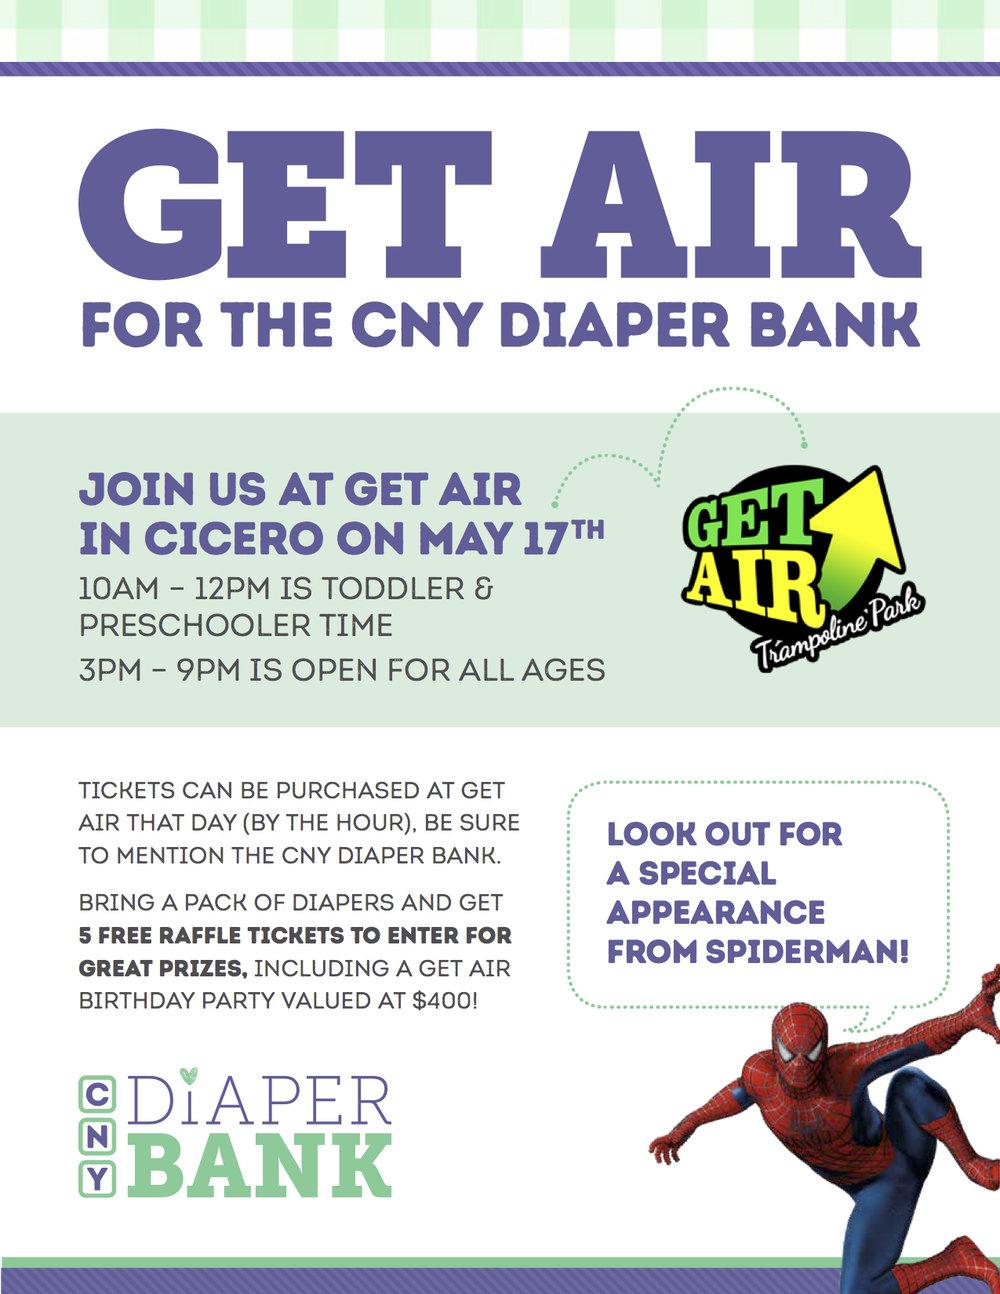 CNY Diaper Bank Get Air Flyer 8.5 x 11.jpg